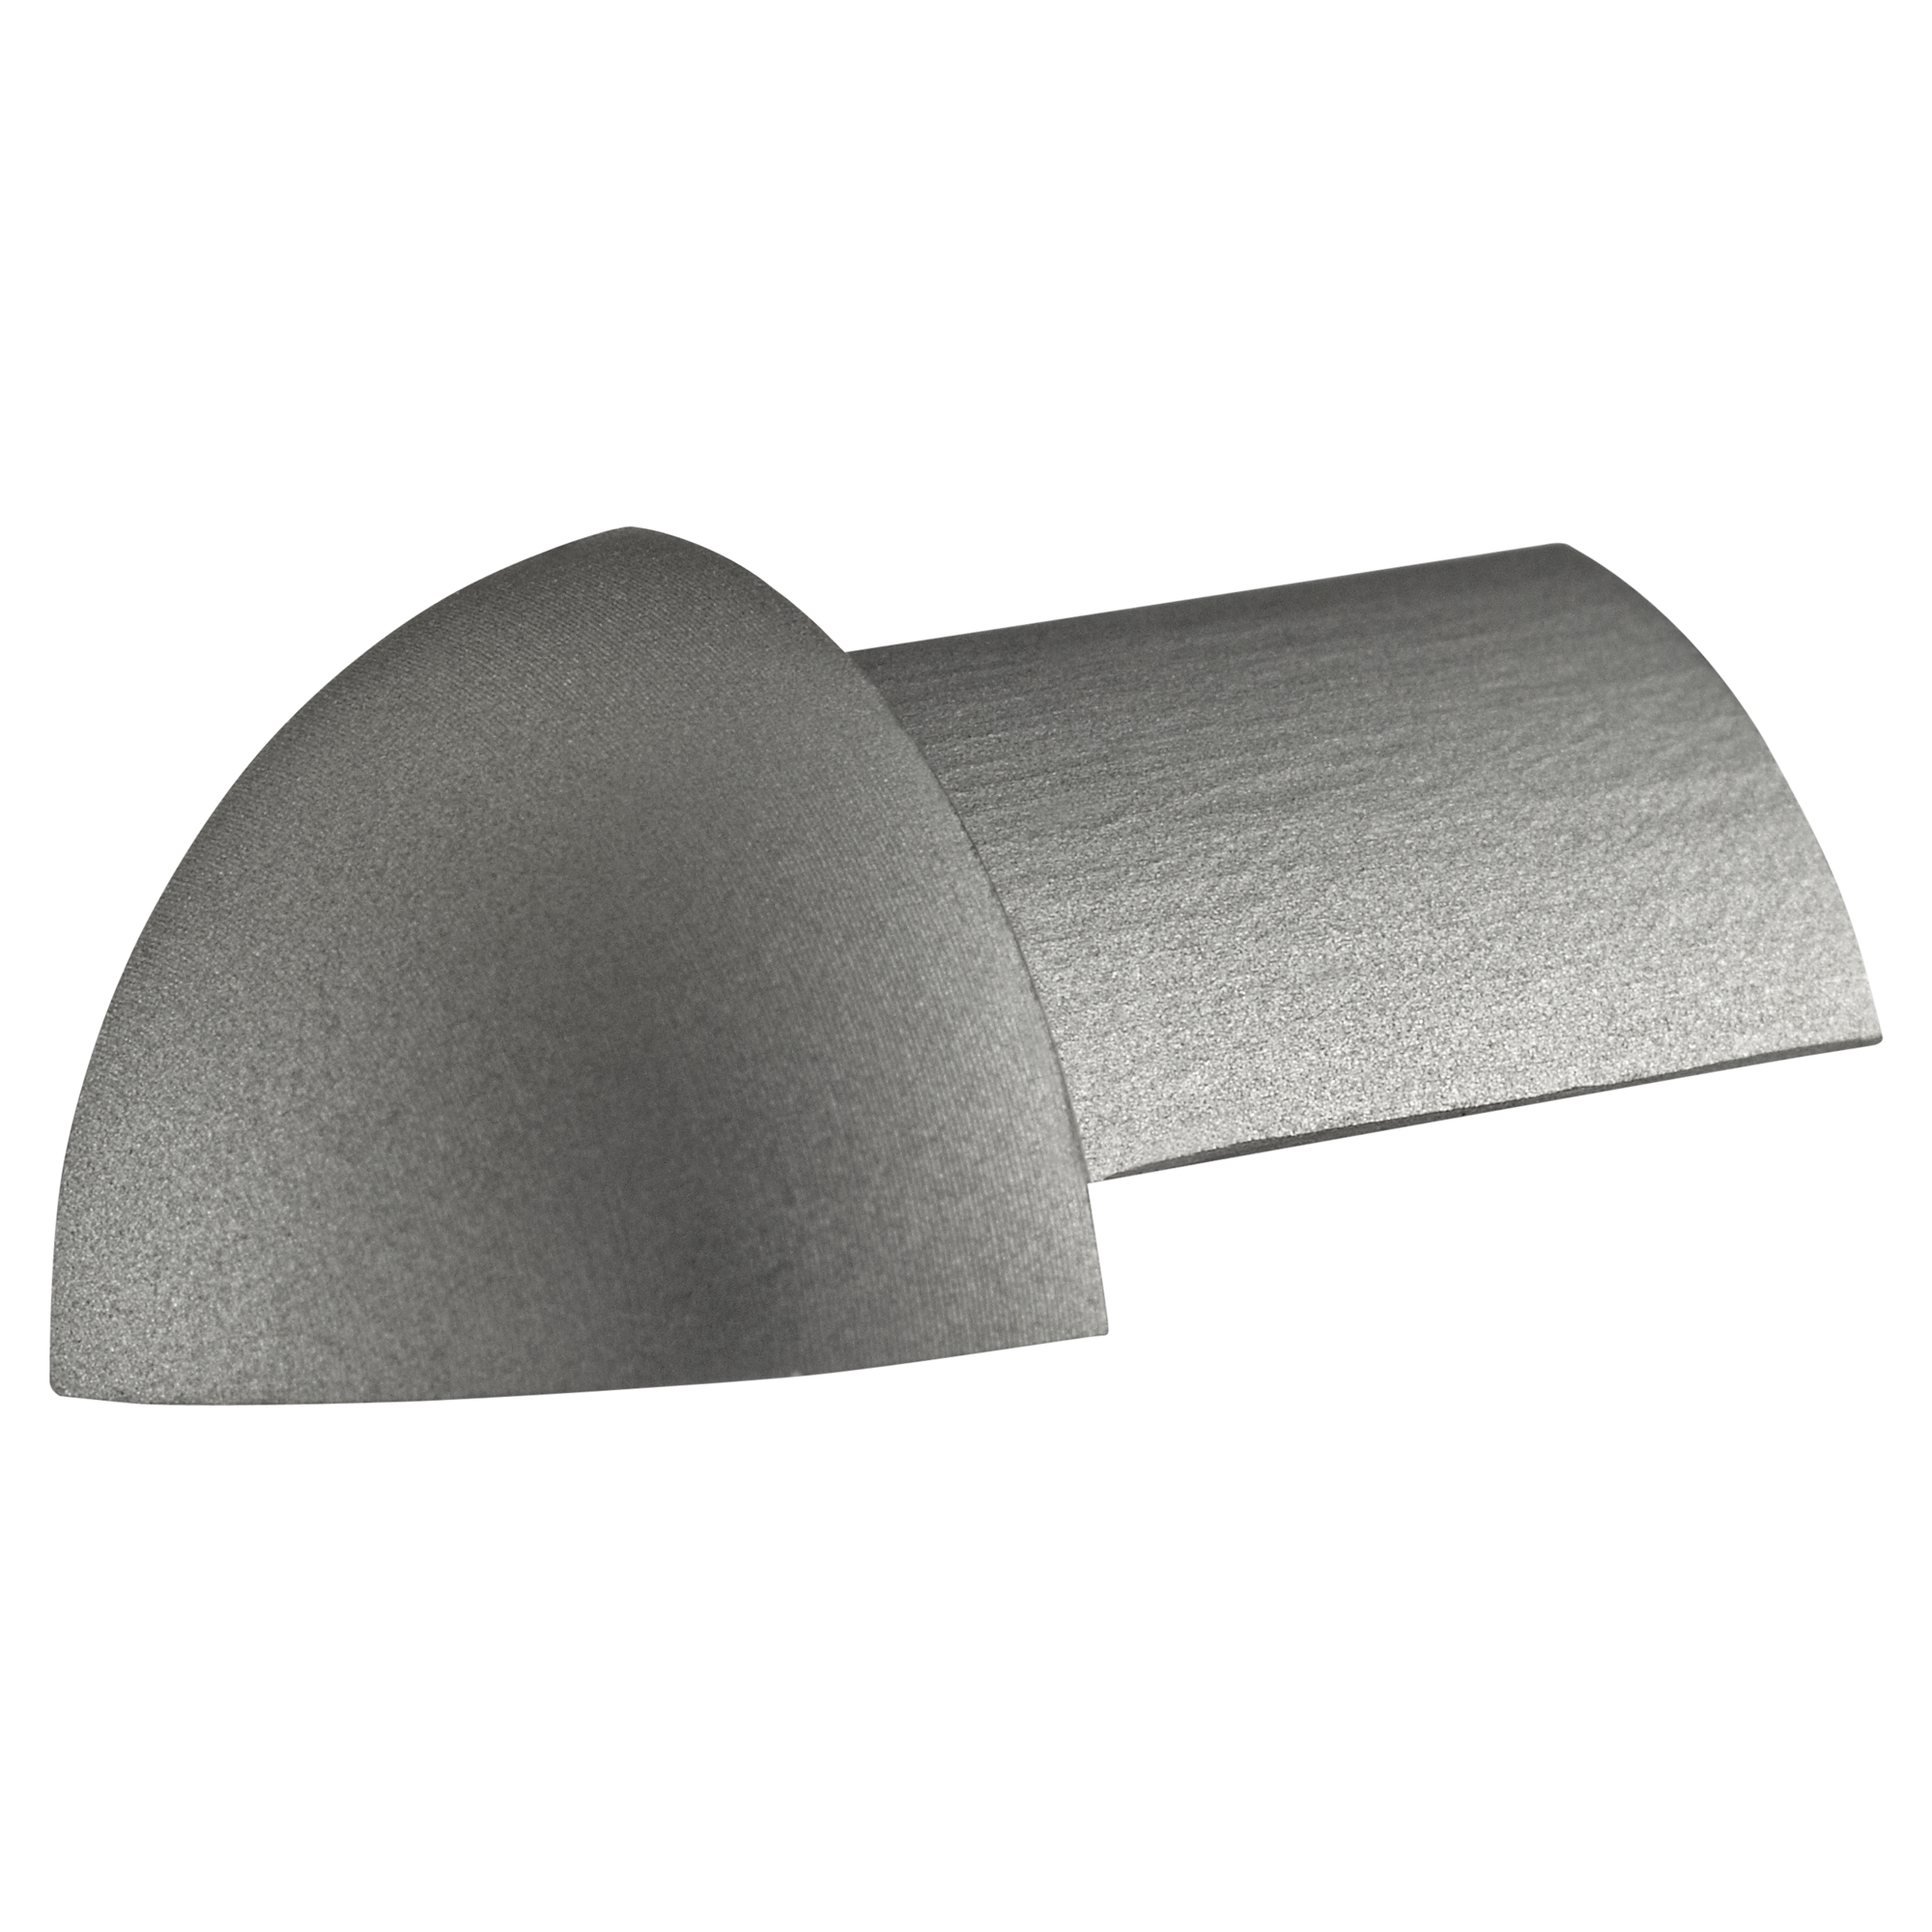 Außenecke Aluminium Silbern 0,8 Cm